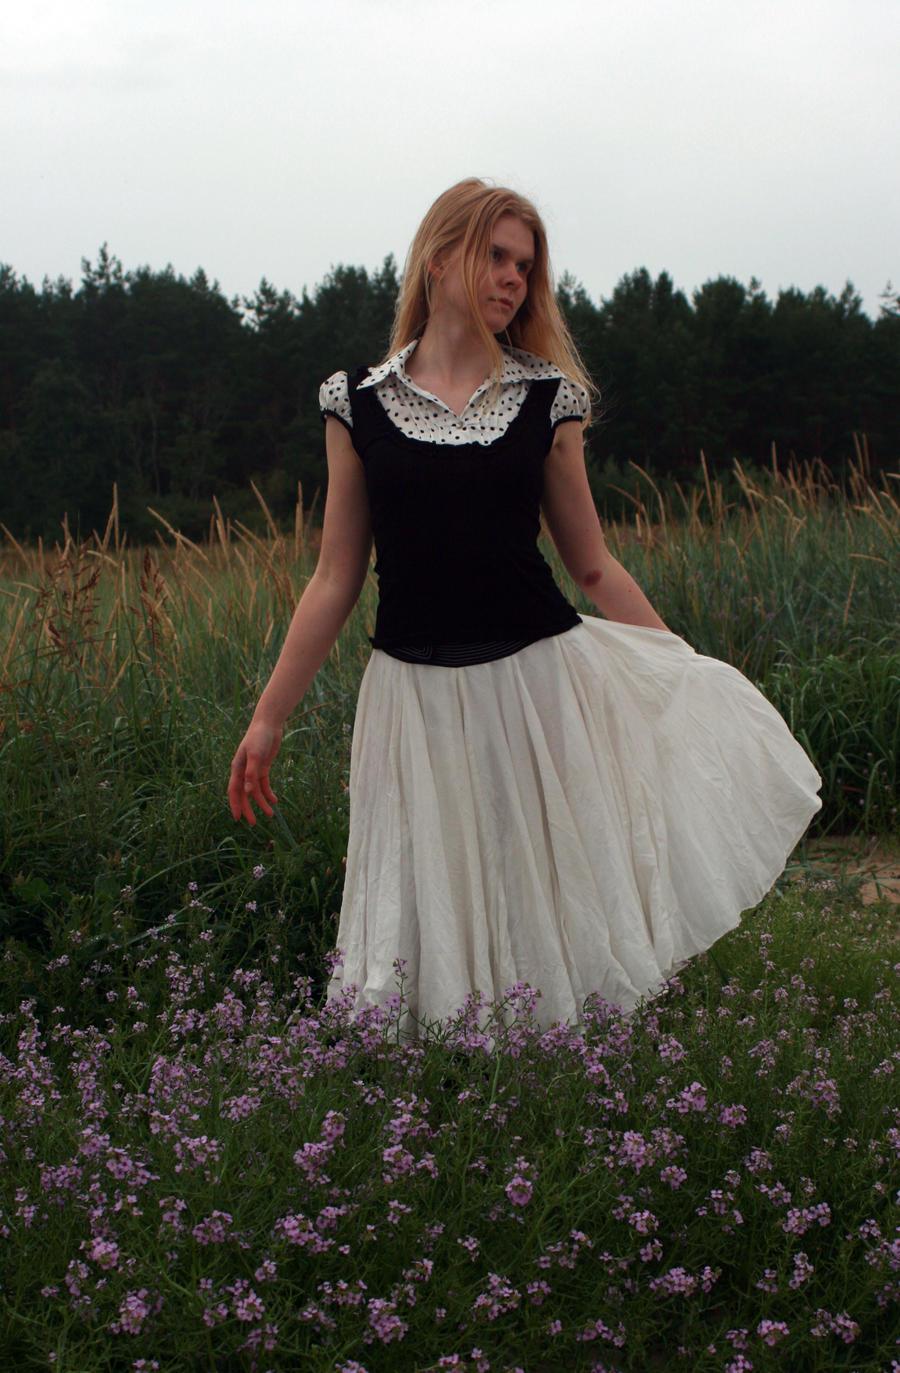 On Flowers 2 by Iardacil-stock